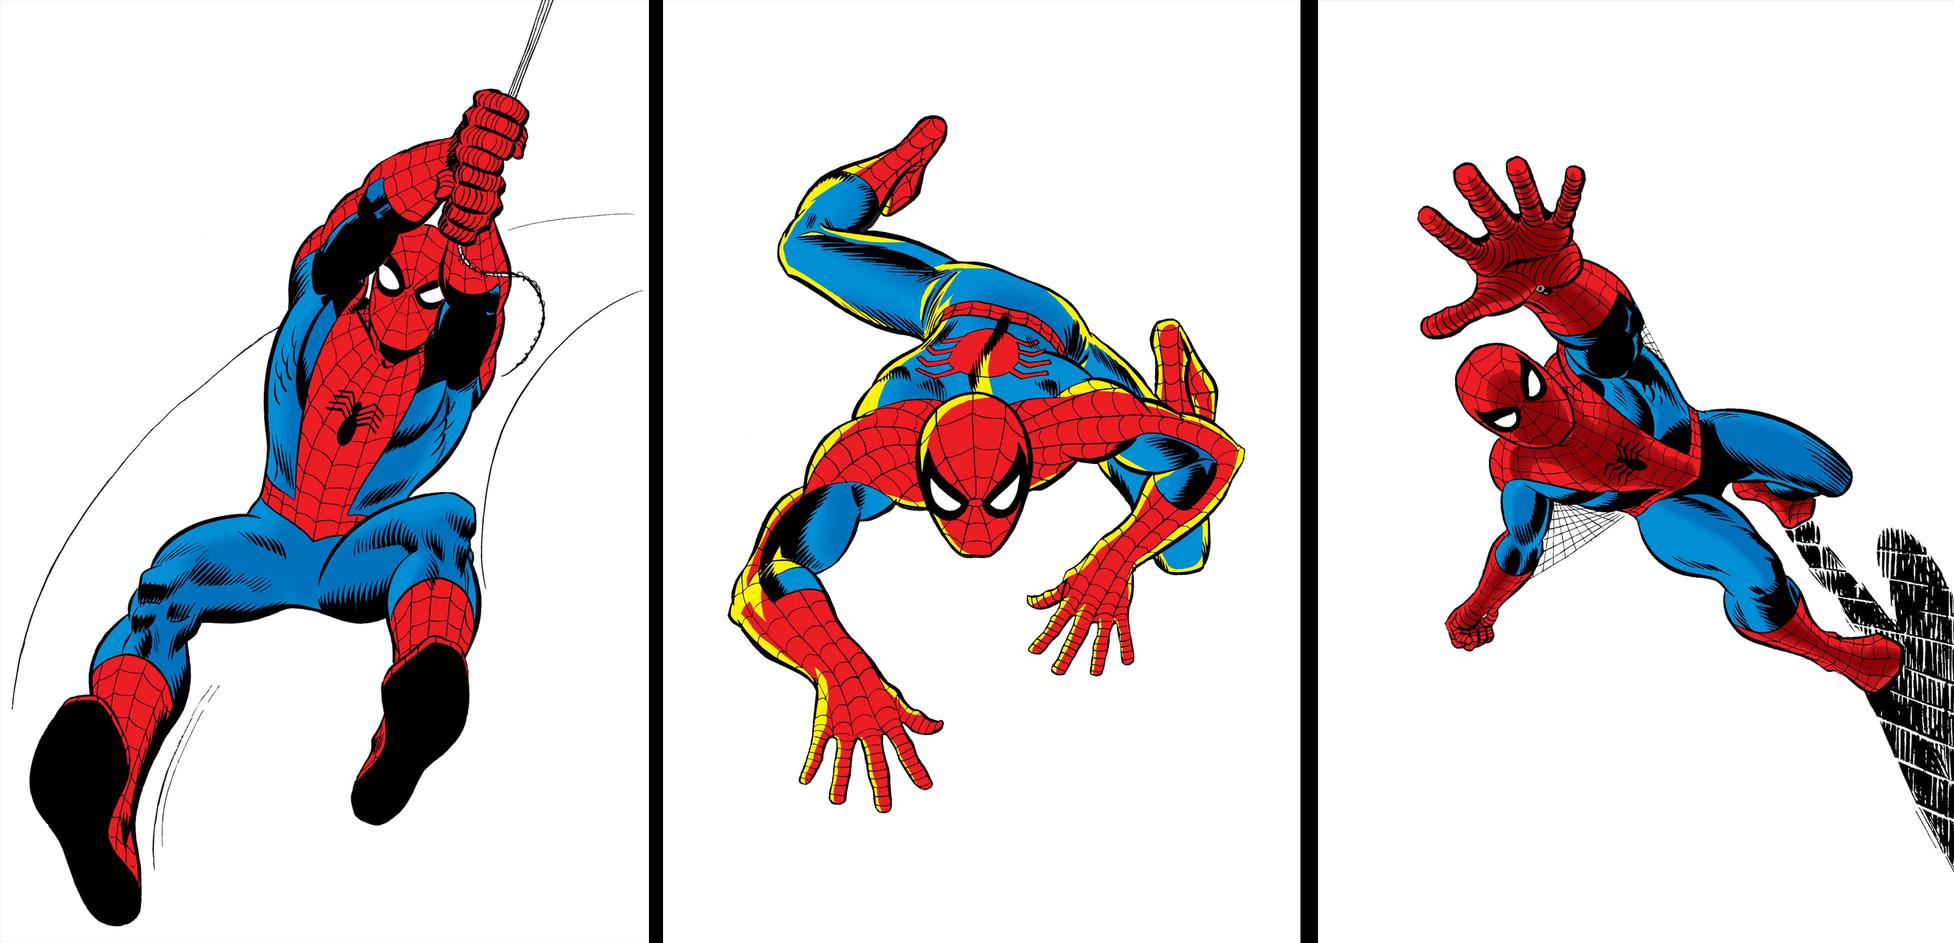 Spider-Man by John Romita